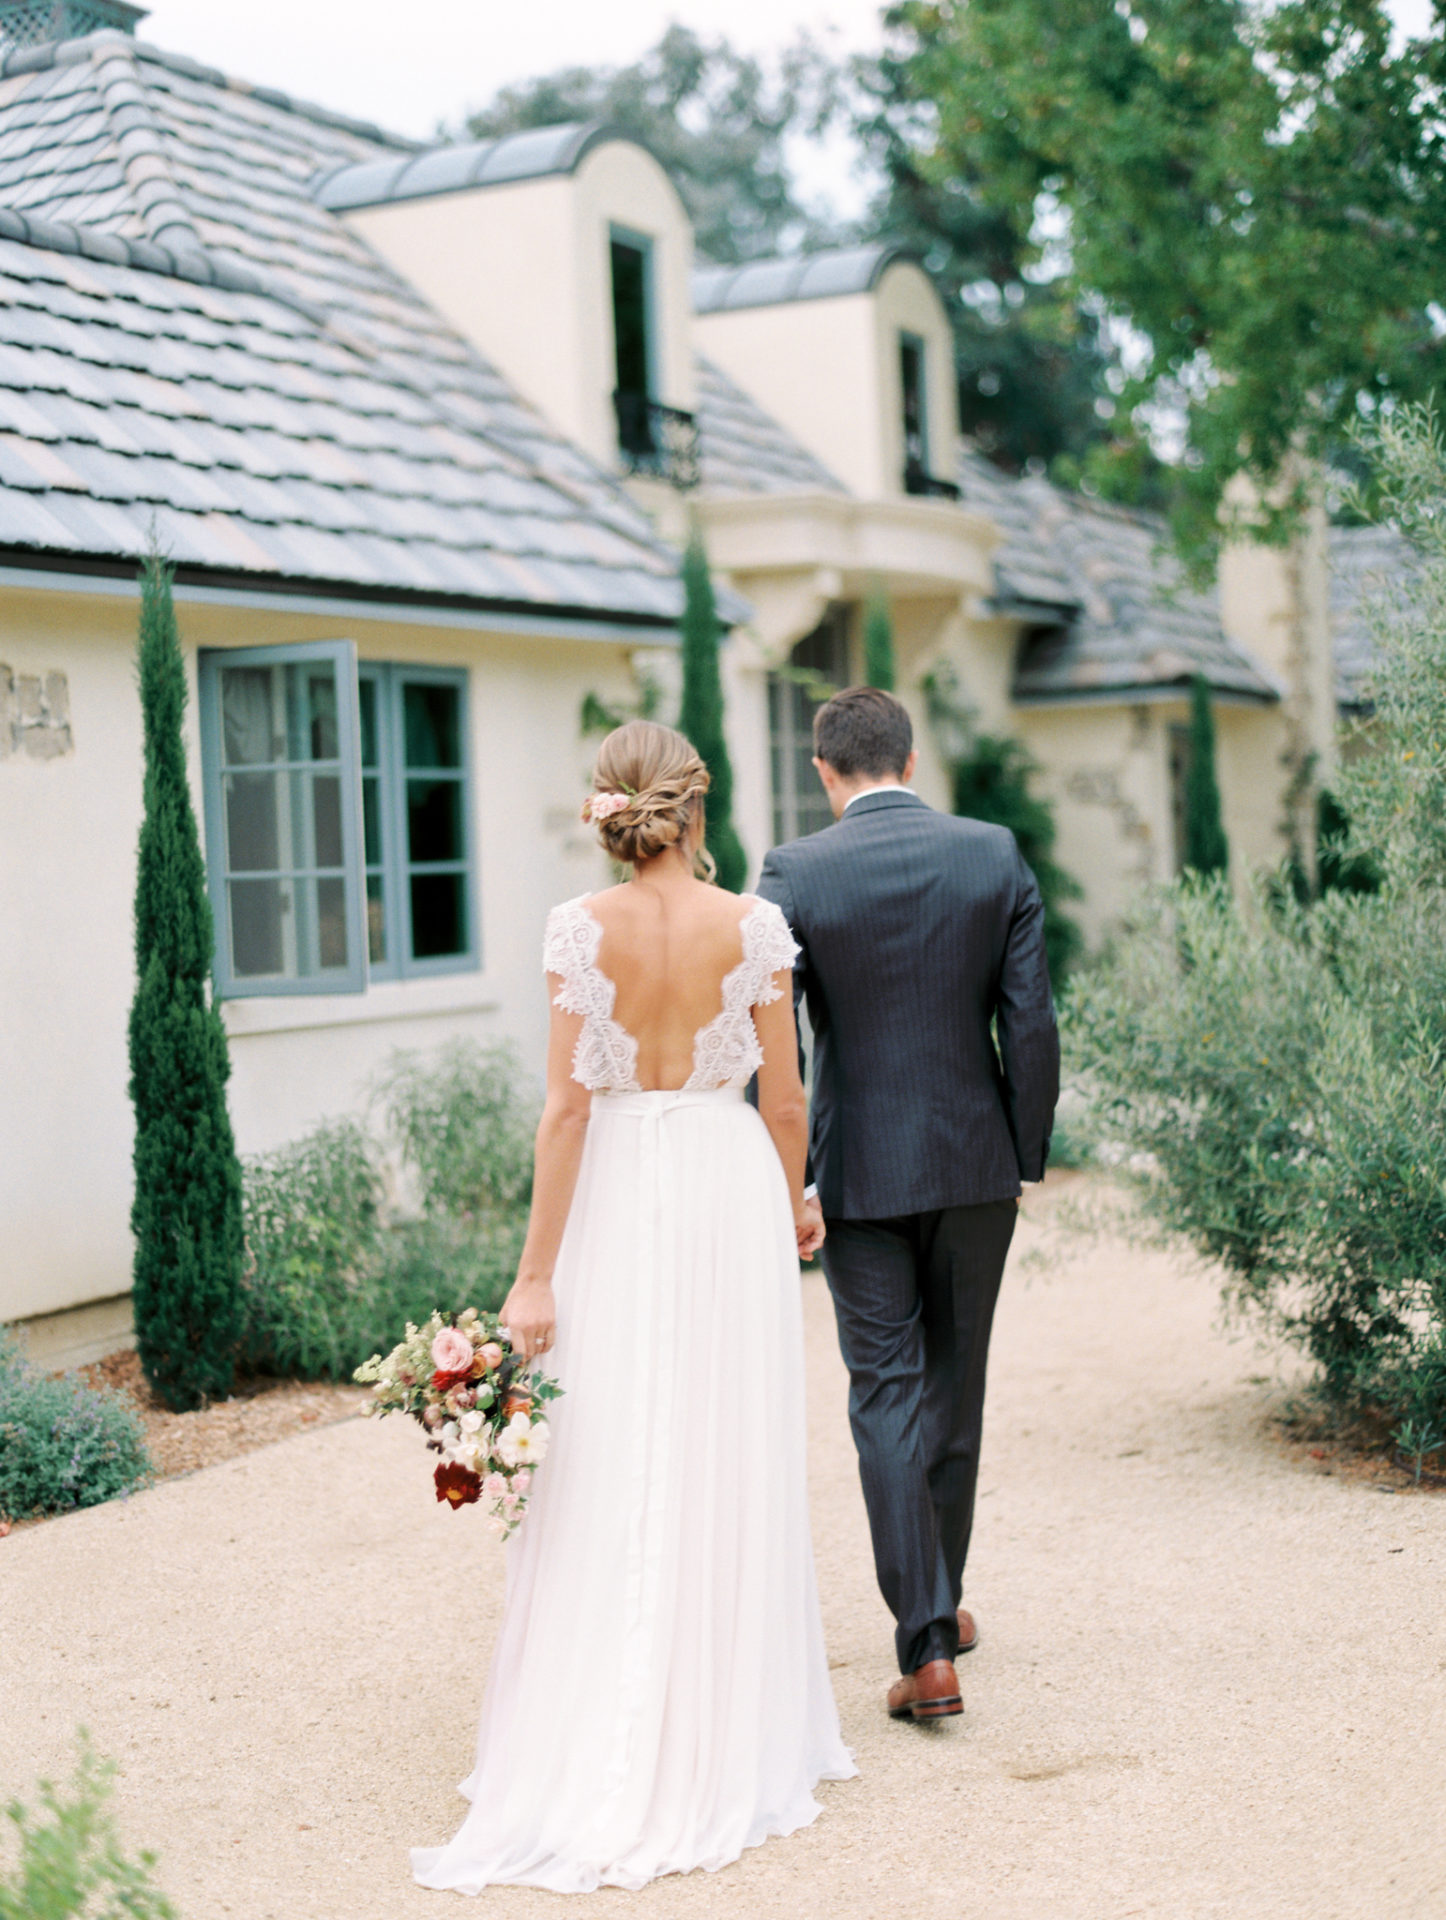 Timeless Spring Wedding Design With A Modern Twist Florals